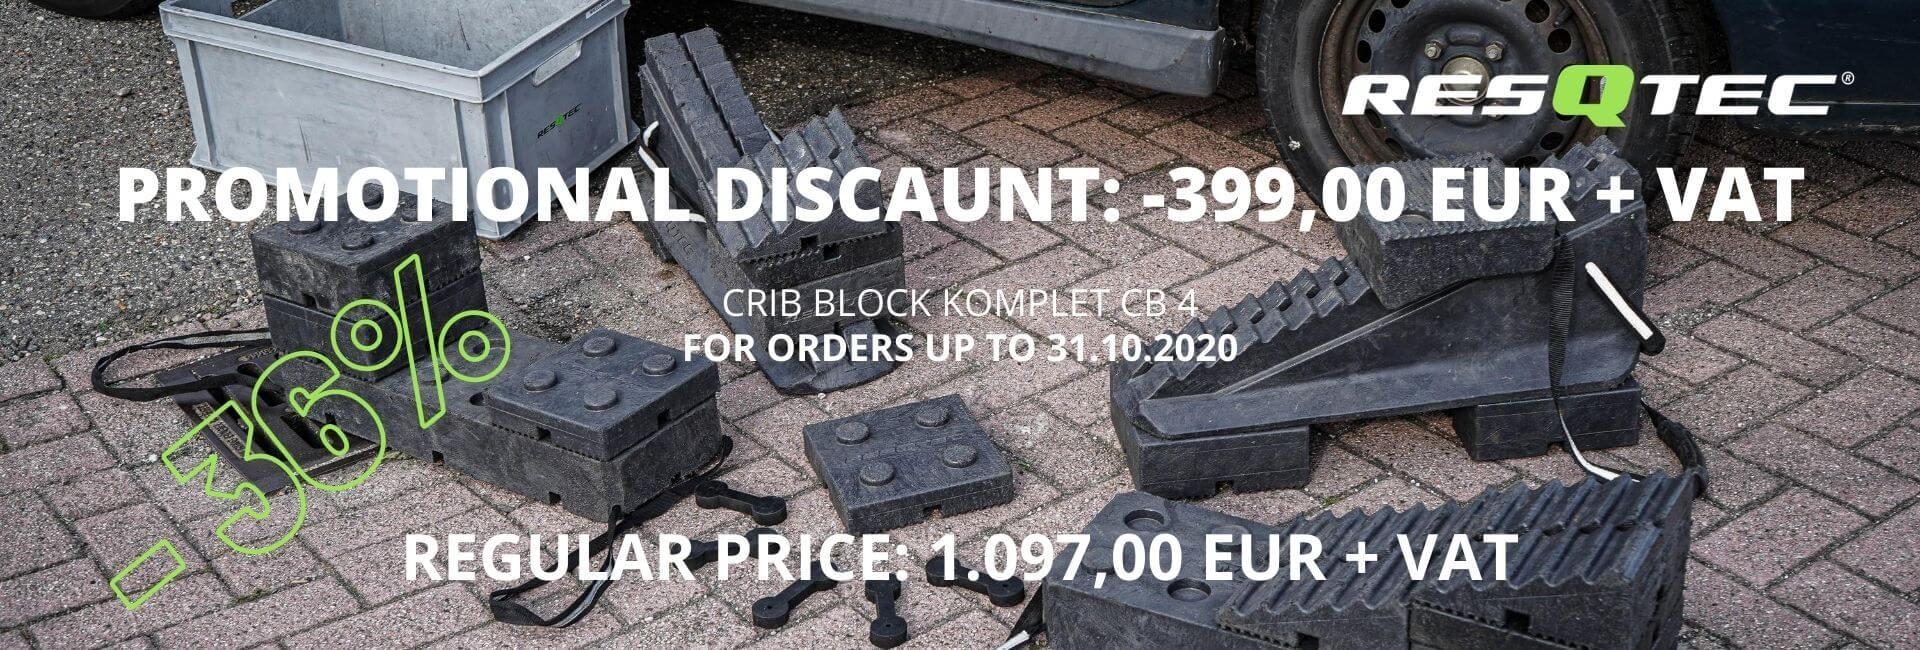 Promotionla discaunt CRIB BLOCK SET CB 4